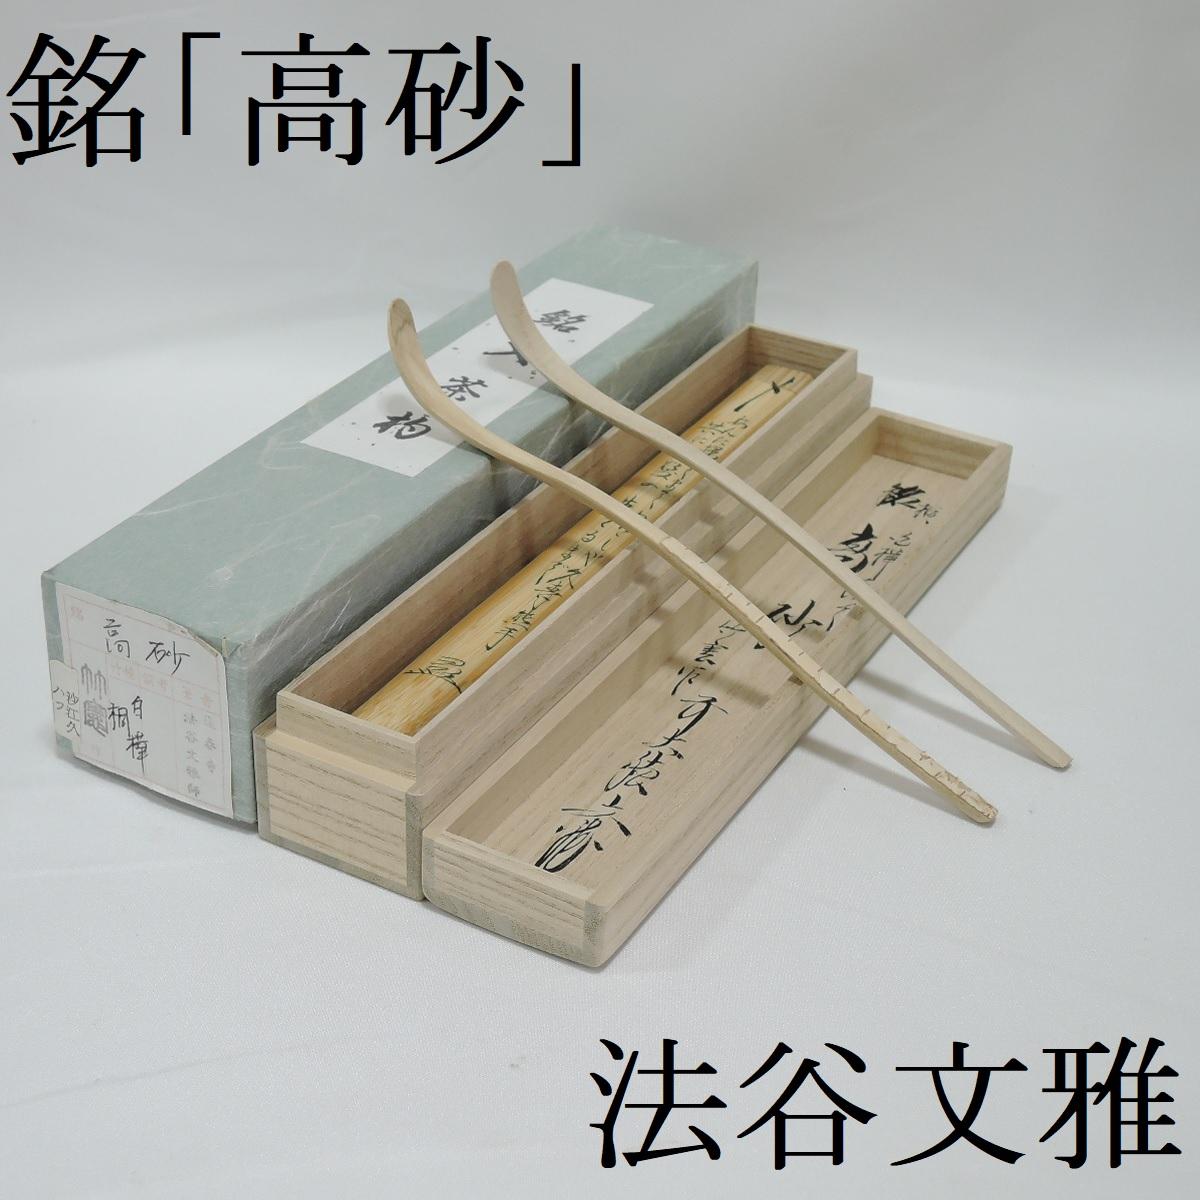 【中古】法谷文雅書付 銘「高砂」 桐 白樺を以って 茶杓 宮下竹憲作 茶道具【美品】